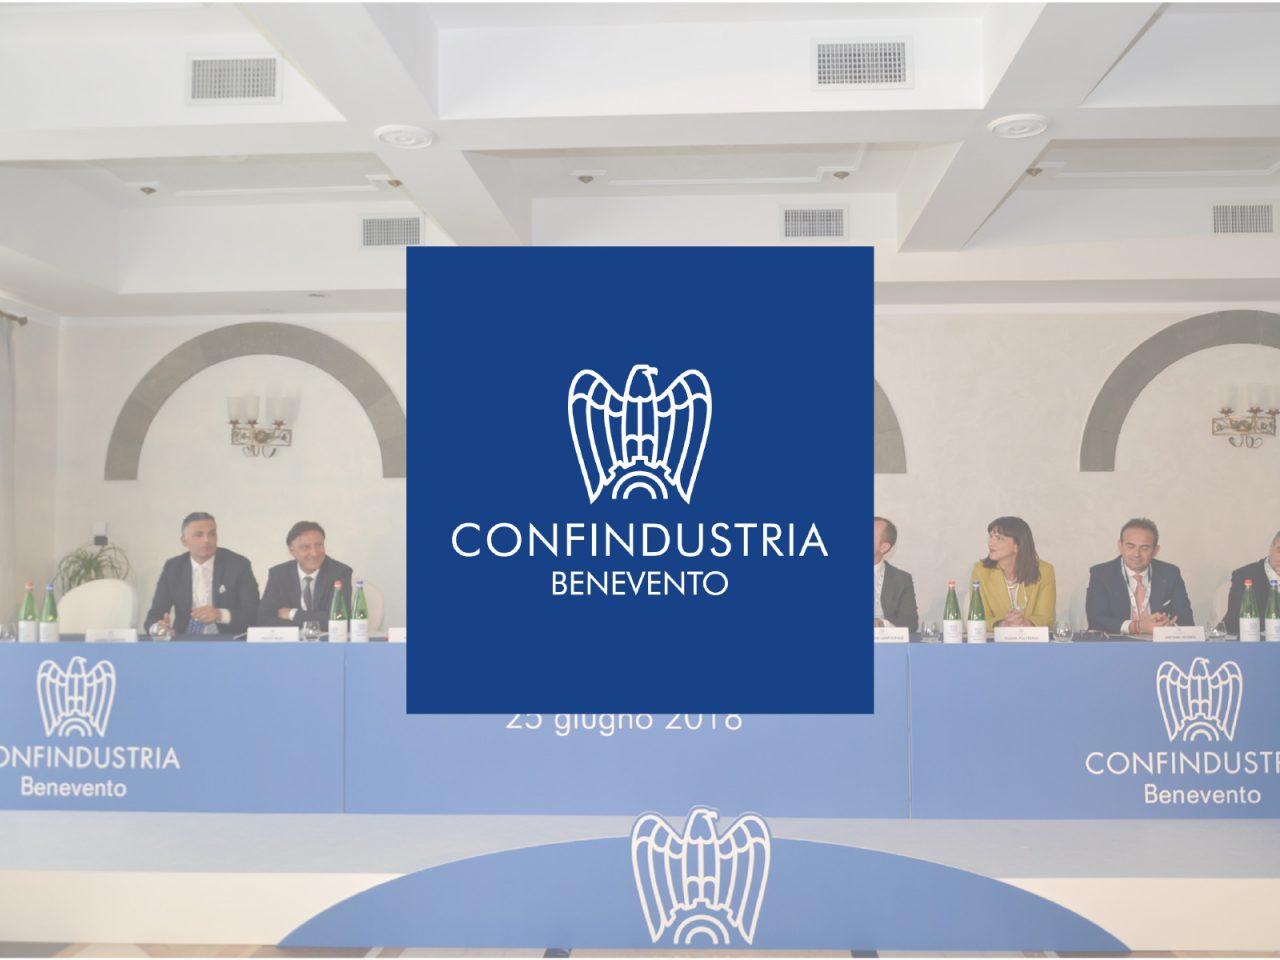 Confindustria Benevento